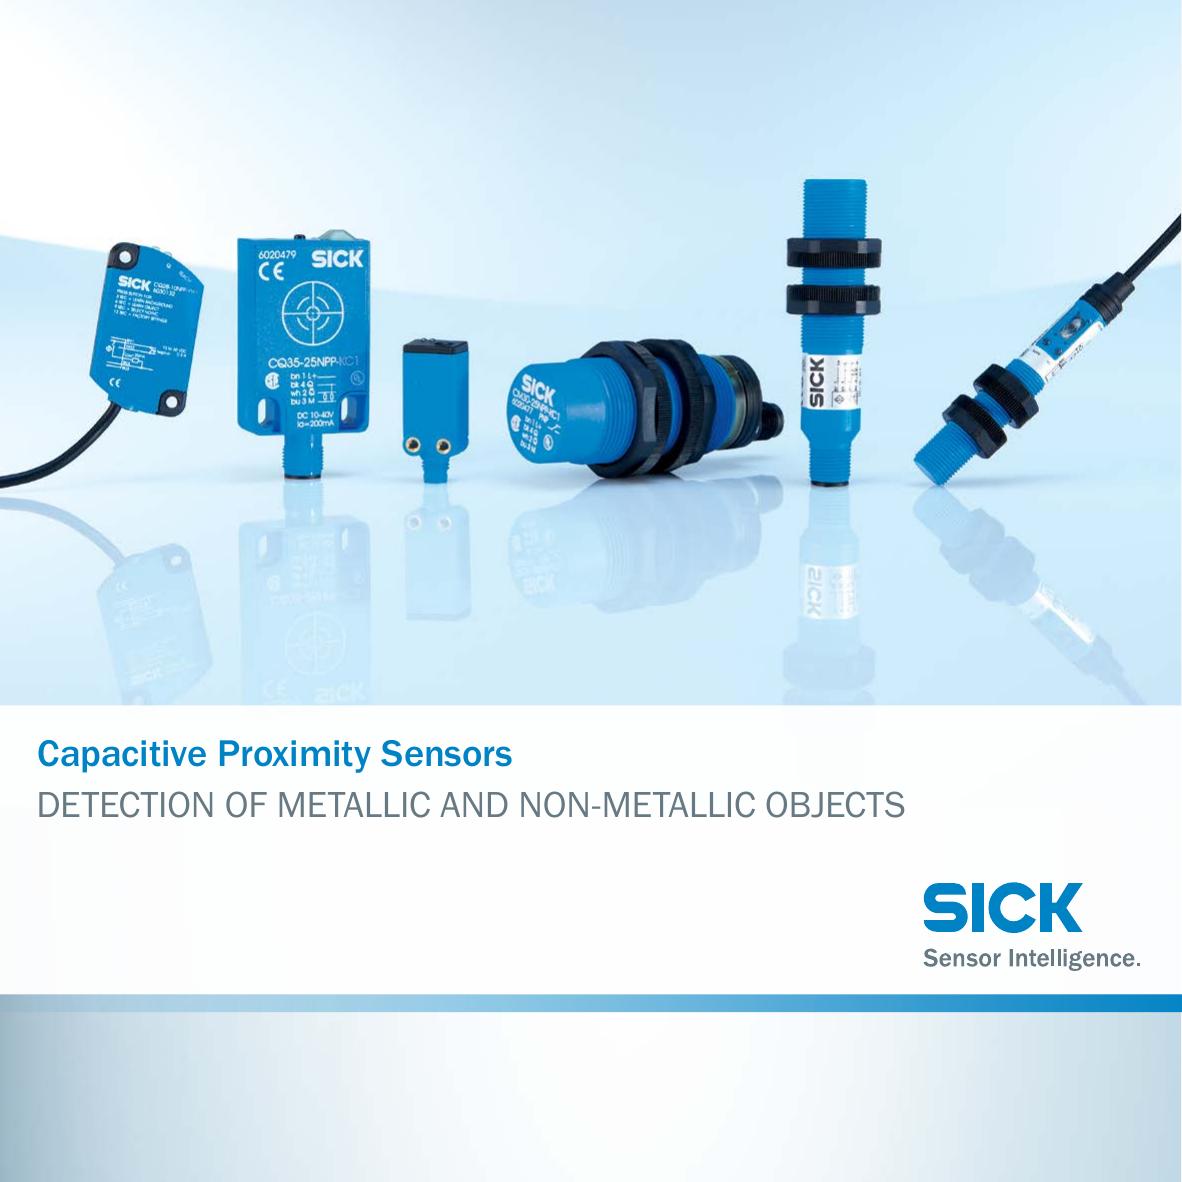 Capacitive Proximity Sensors DETECTION OF METALLIC AND NON